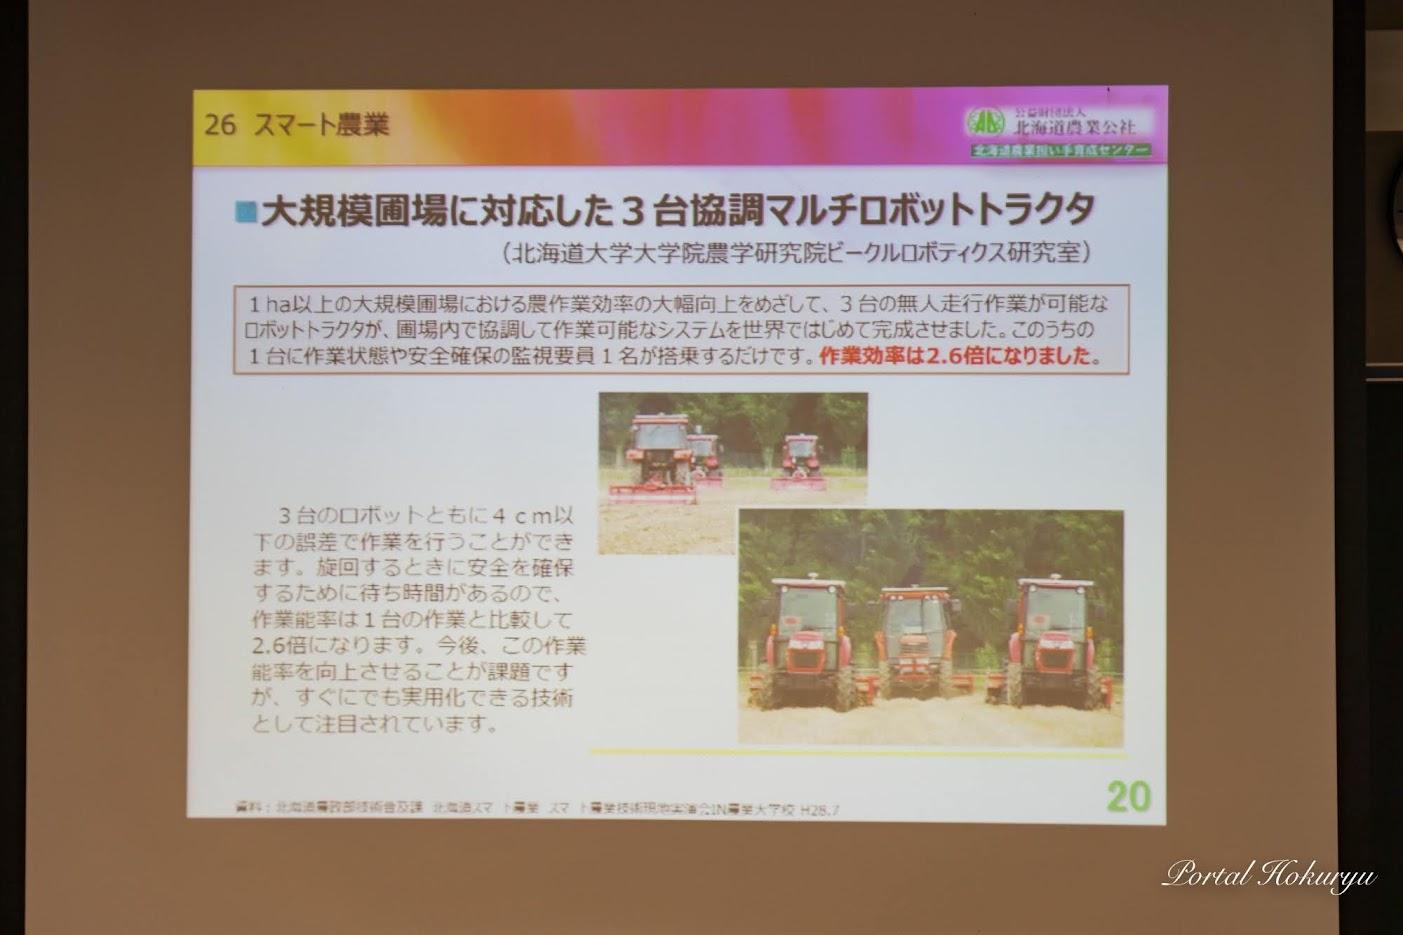 地域営農支援組織の整備 → 機械化